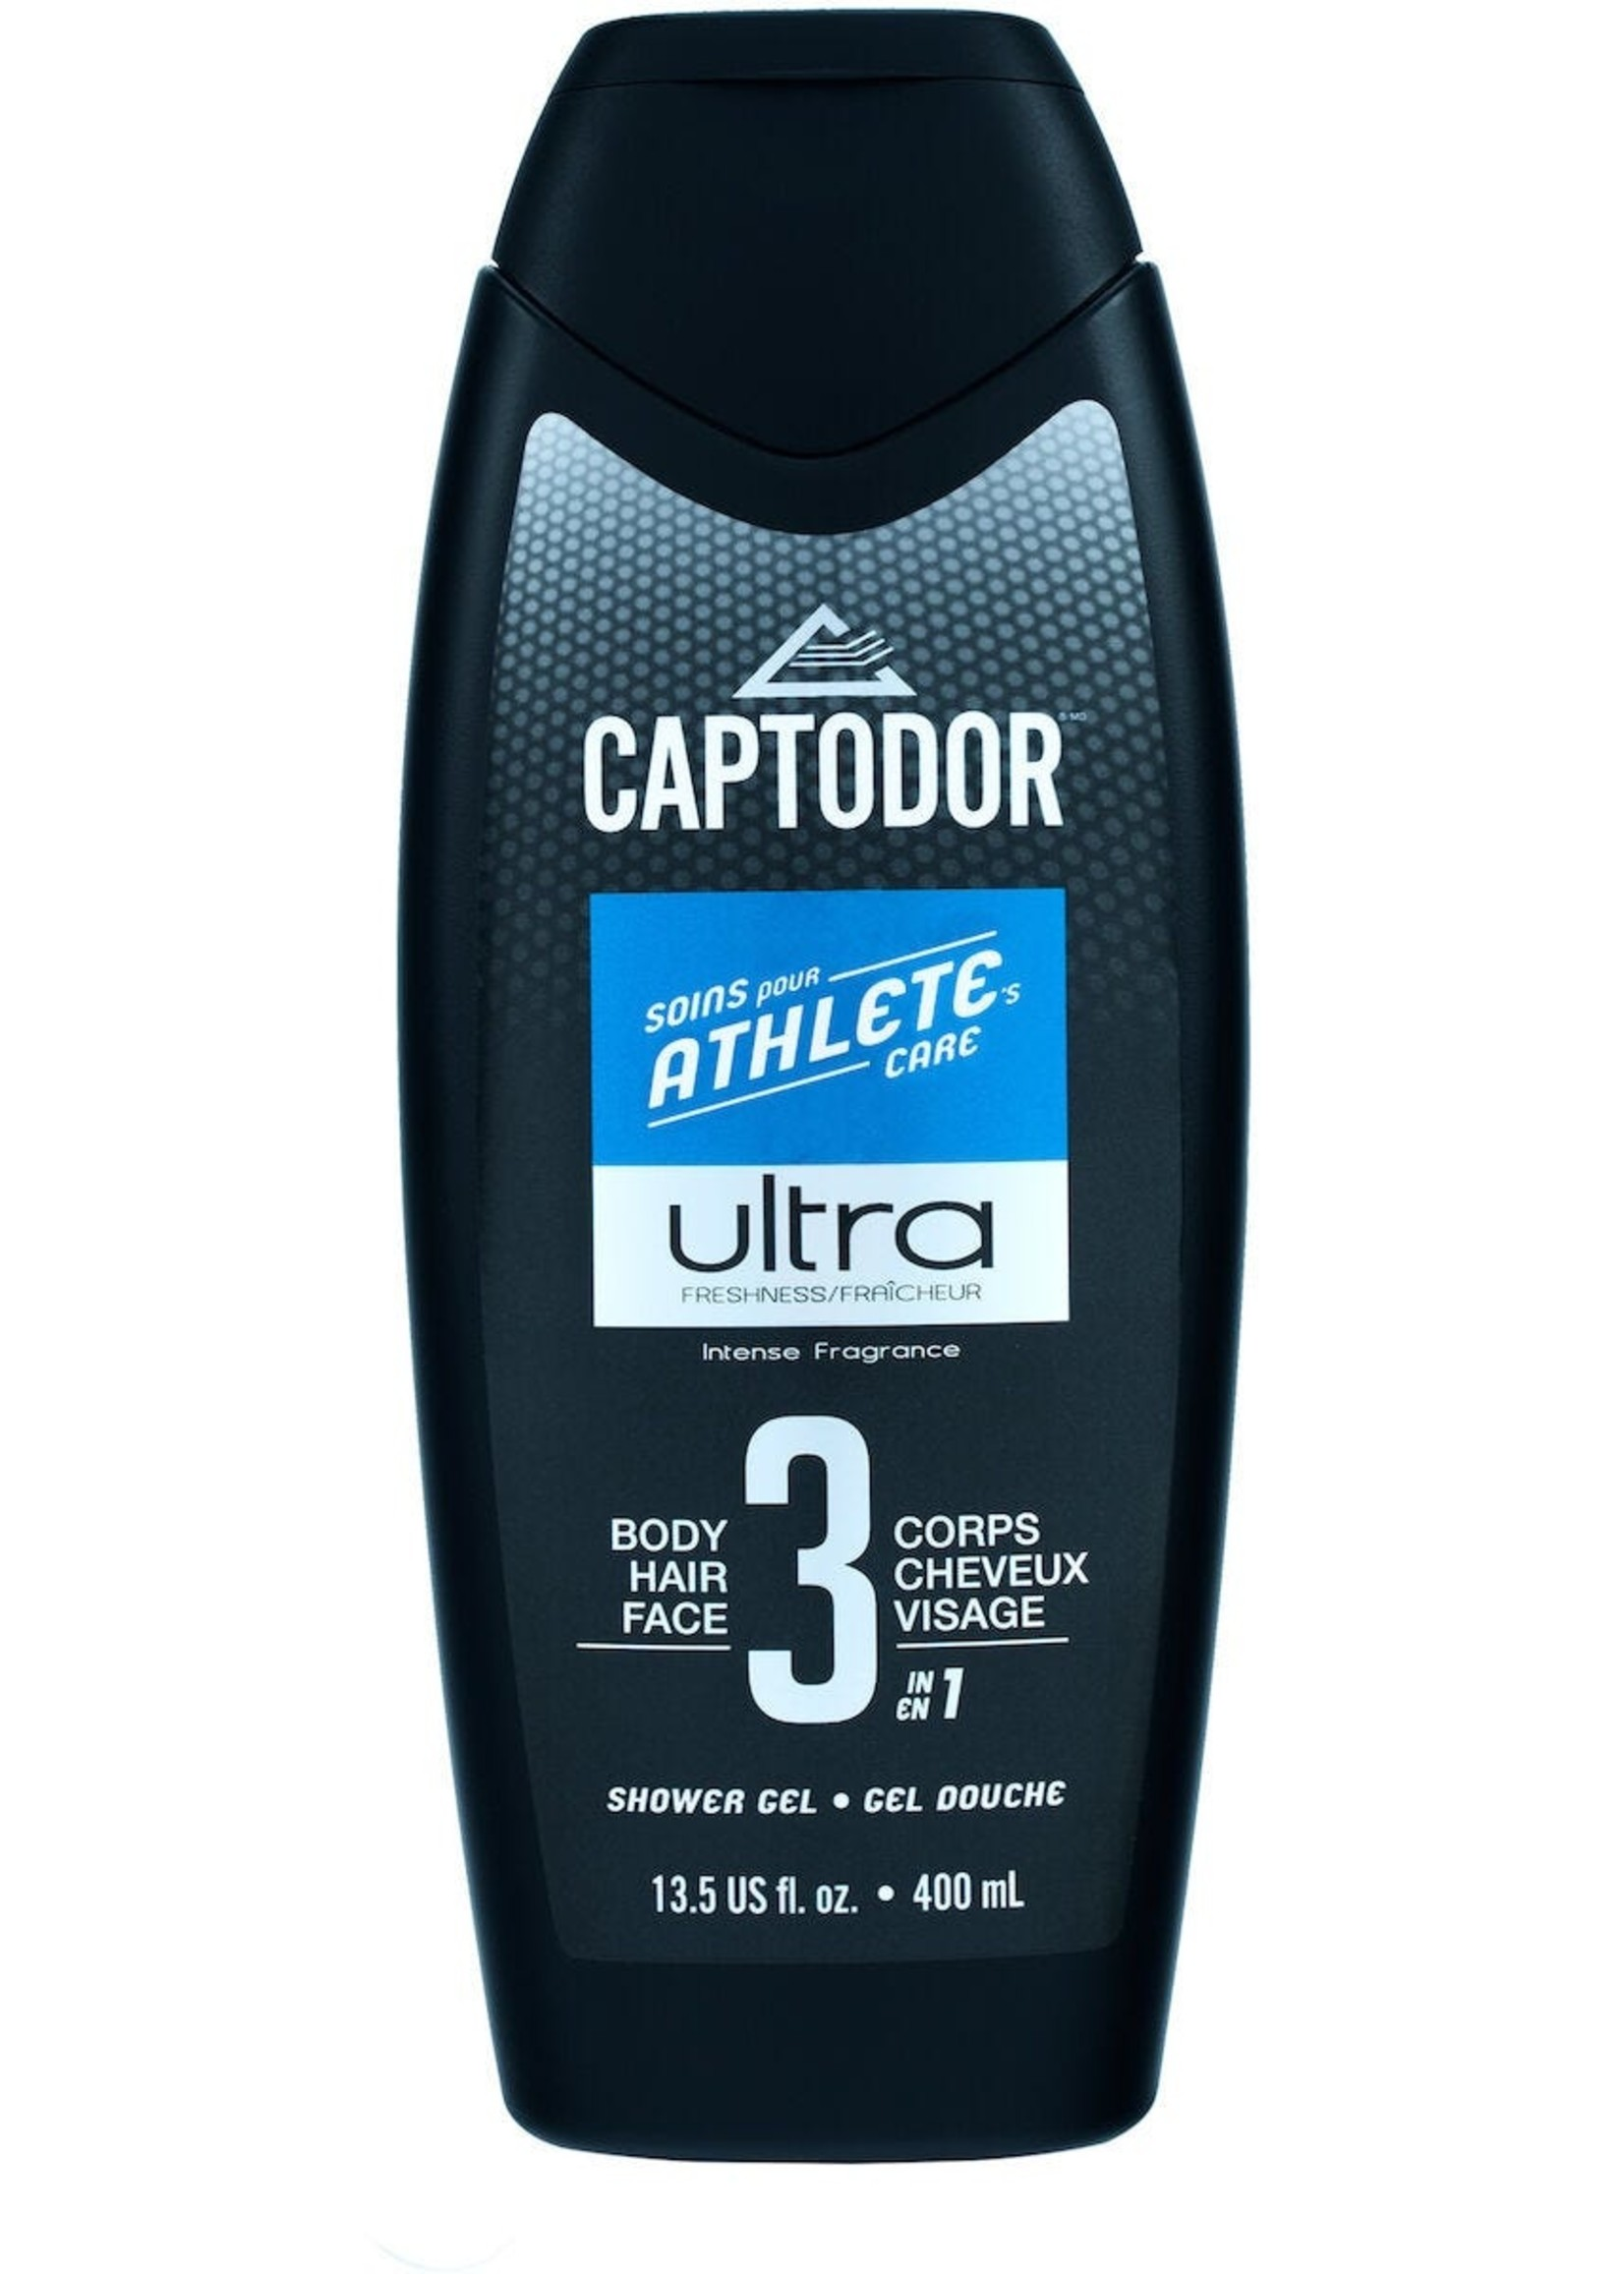 Captodor Captodor Shower Gel ULTRA 400ml